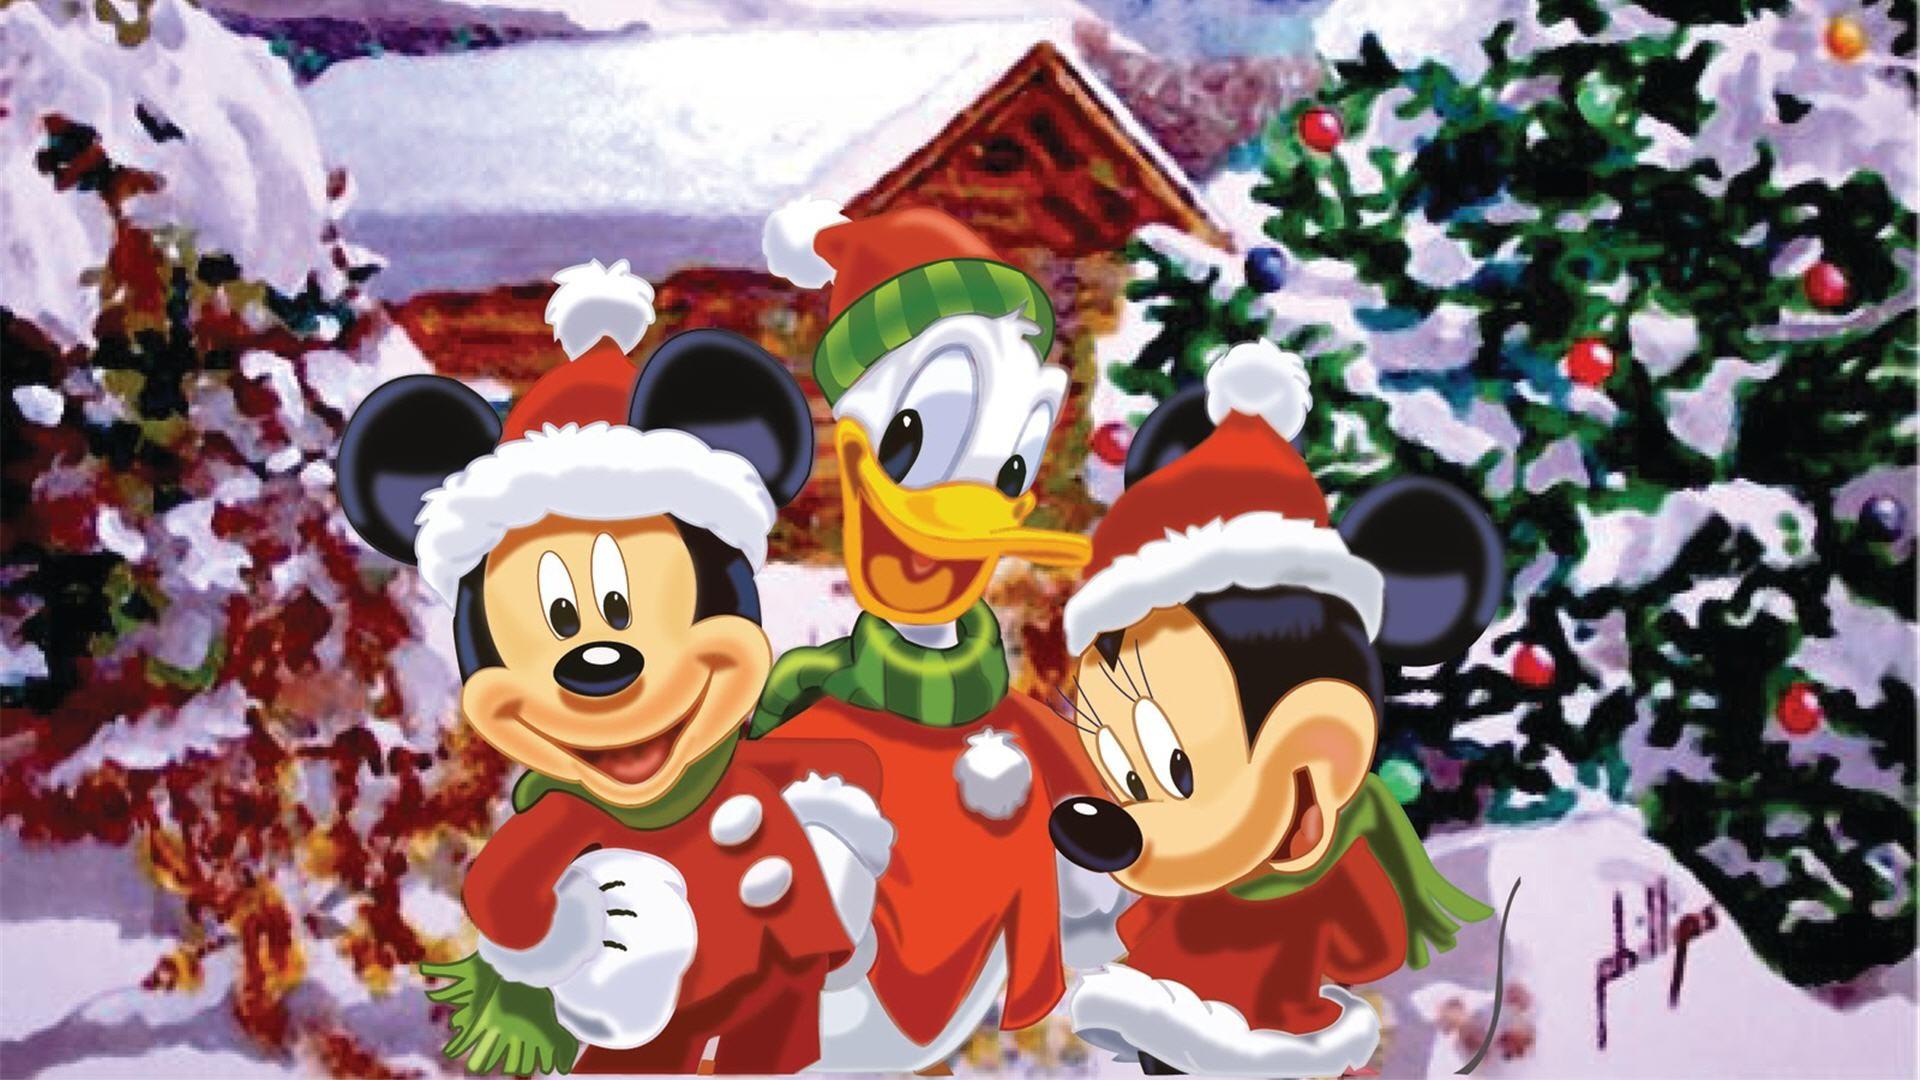 Christmas Disney Wallpaper 58 Images